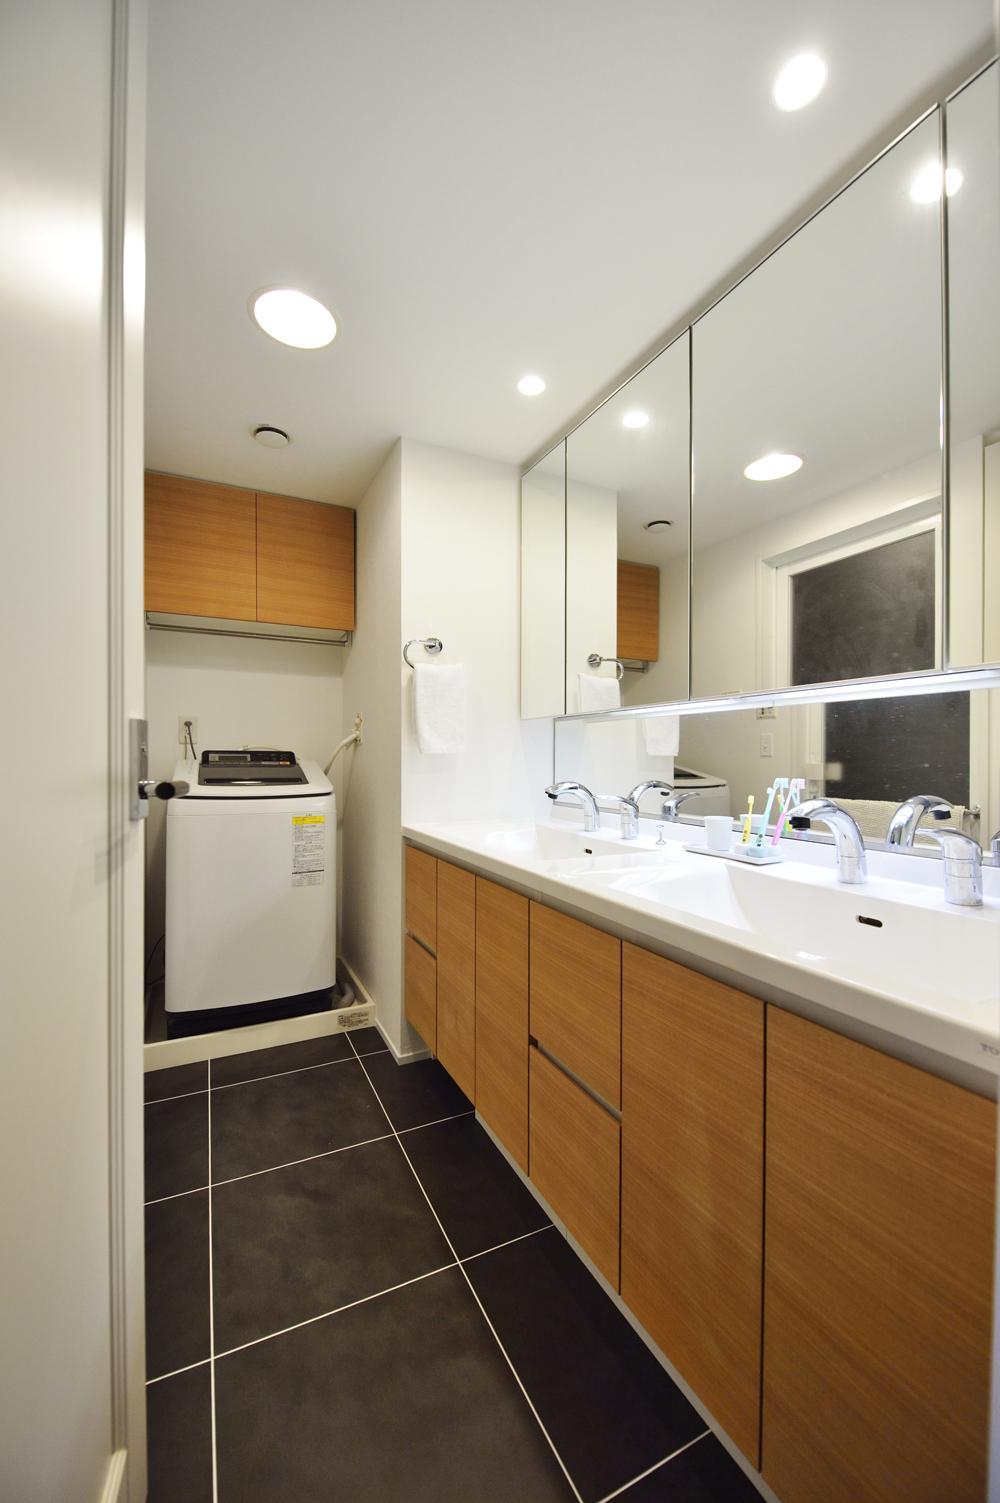 N邸・素足が気もち良い 広々リビングの部屋 大判フロアタイルの洗面所